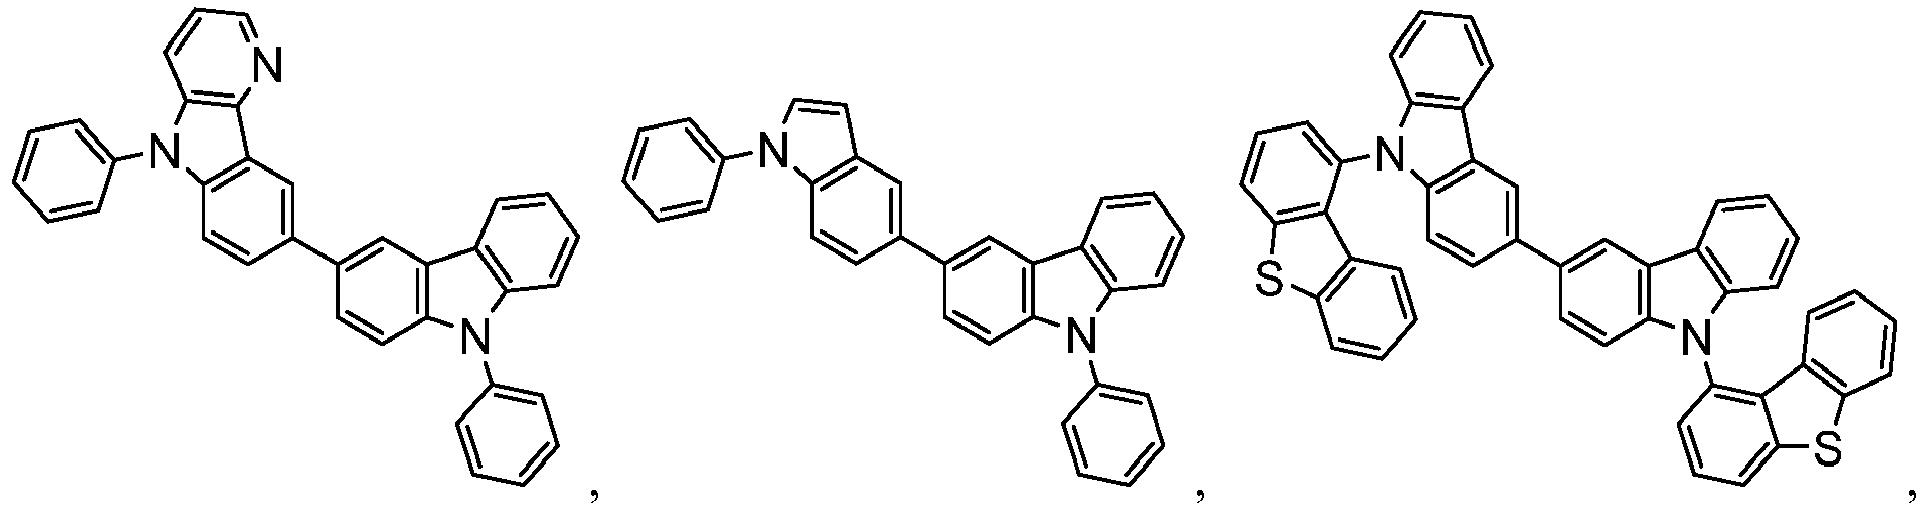 Figure imgb0894